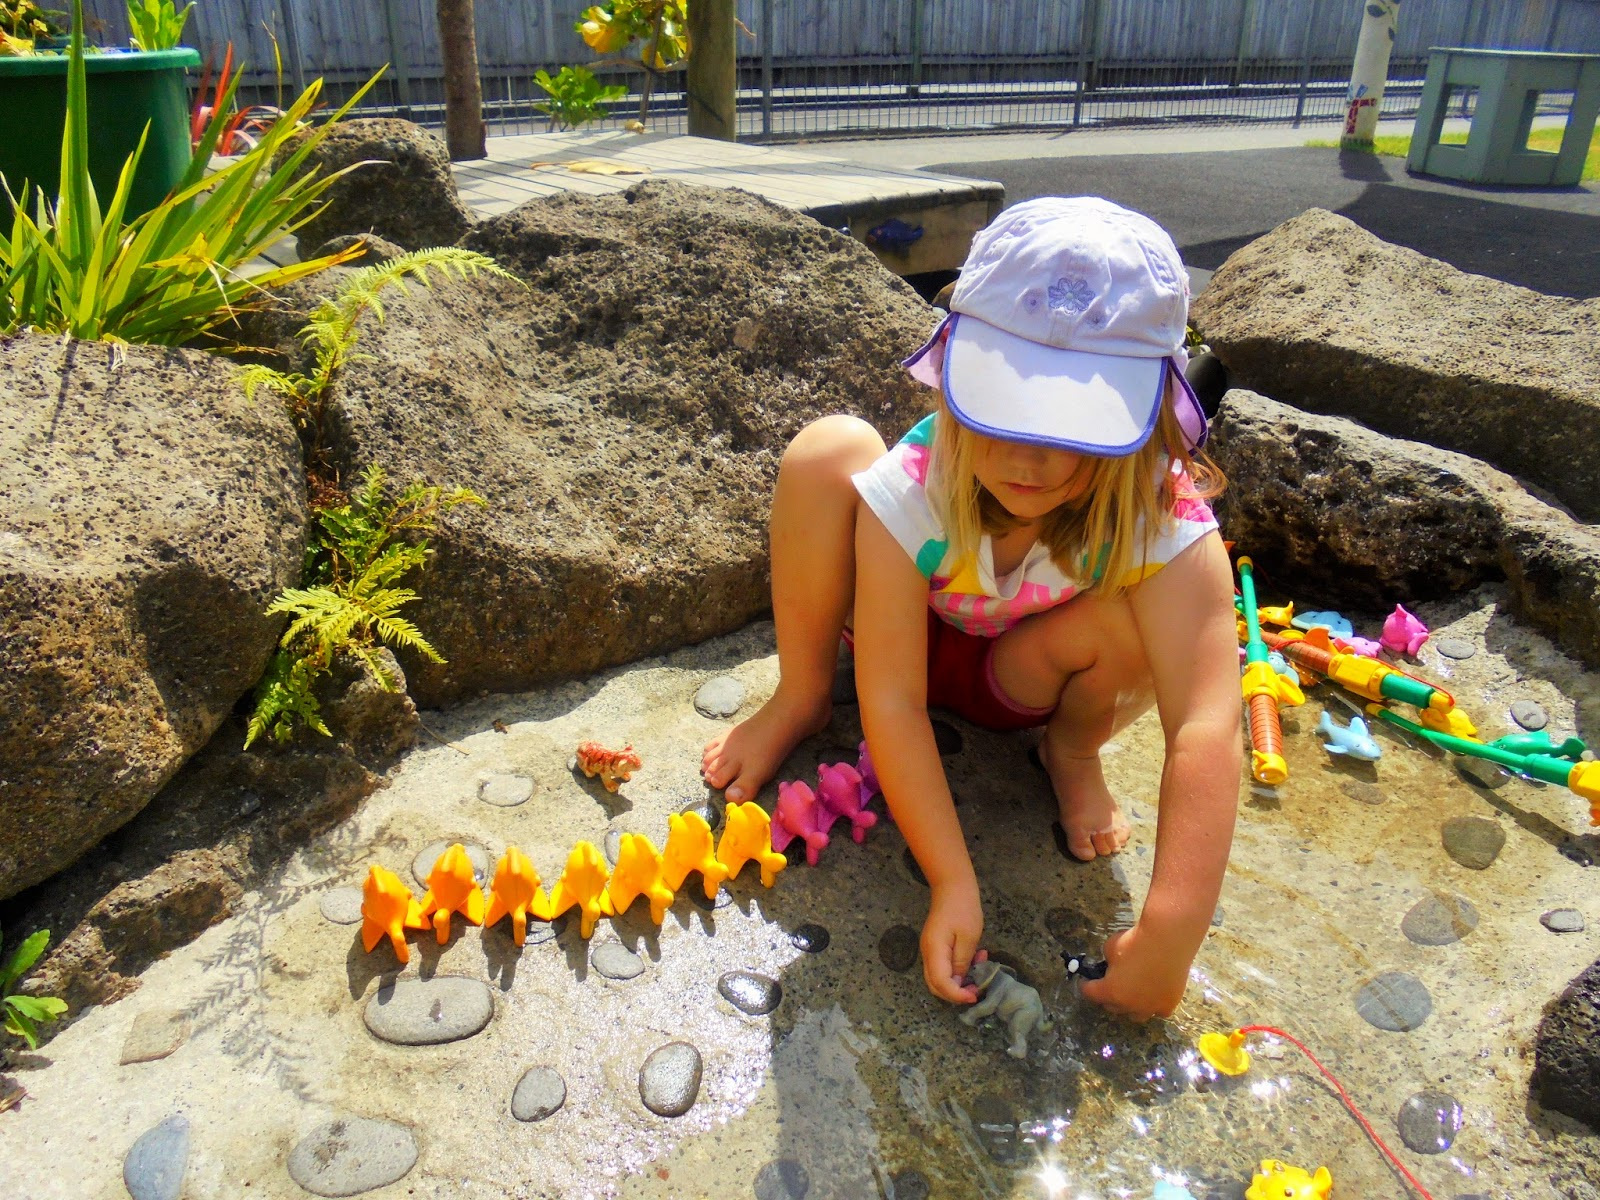 Mairtown Kindergarten The Wonders Of Water Play Increasing Sustainability Awareness